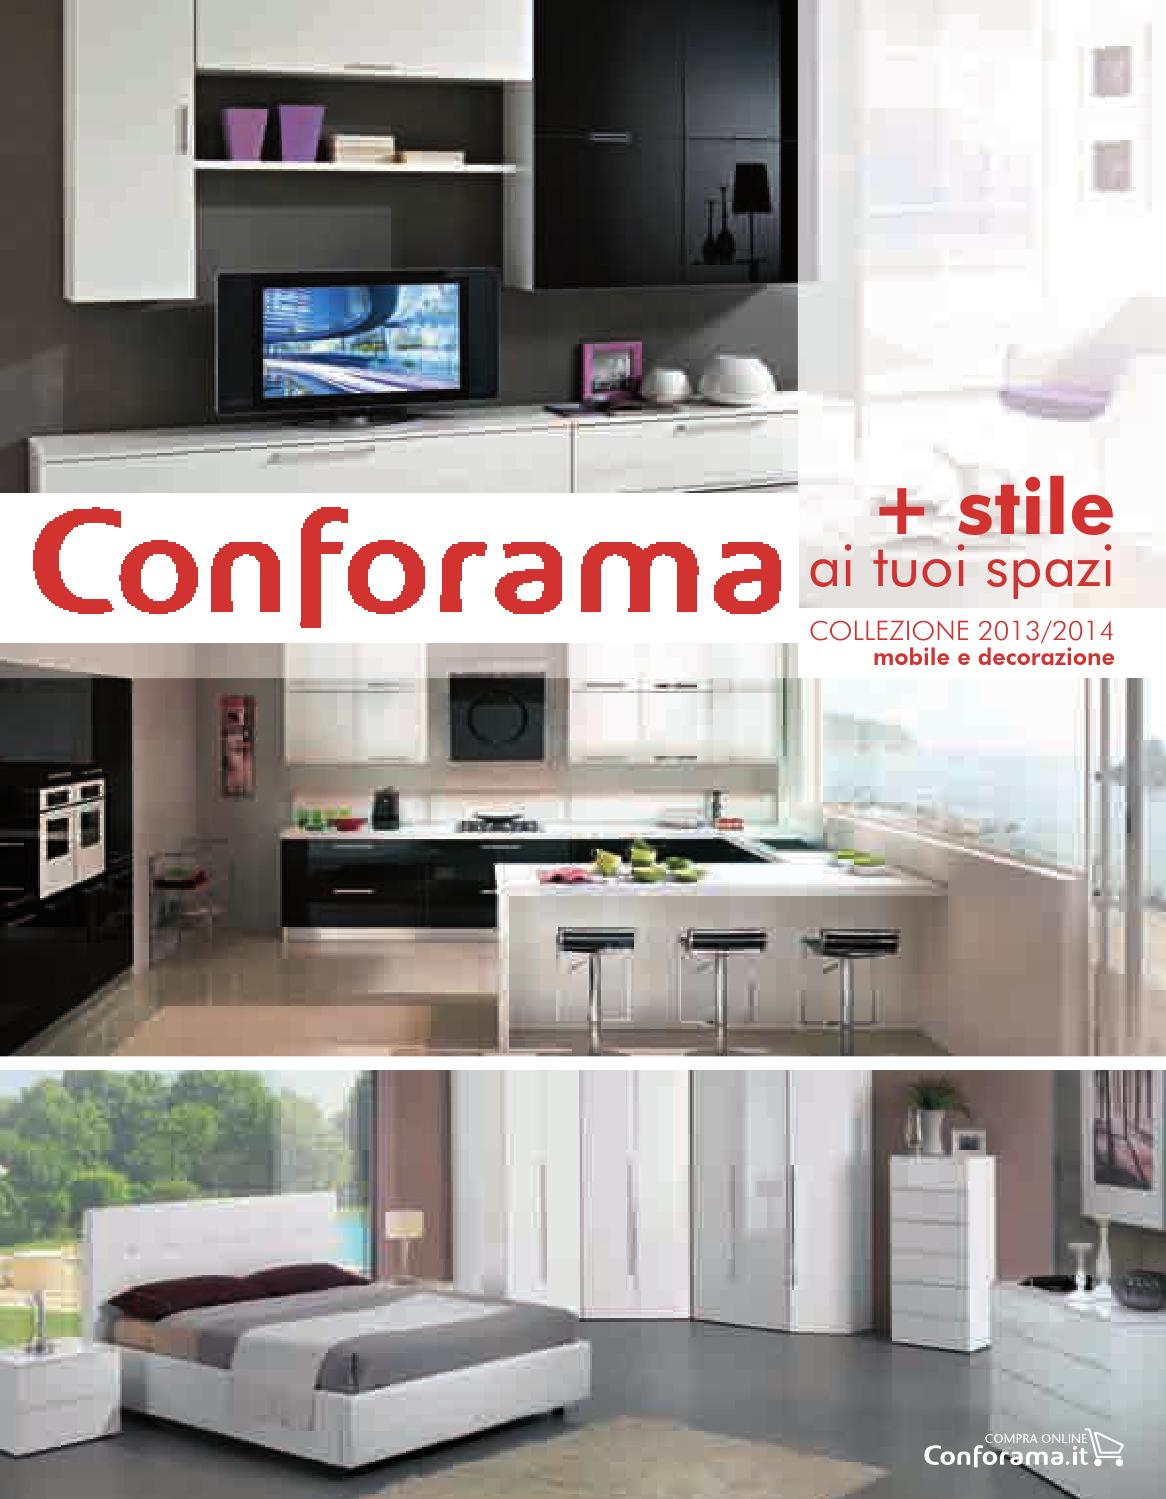 Beautiful Conforama Mobili Cucina Gallery - bery.us - bery.us